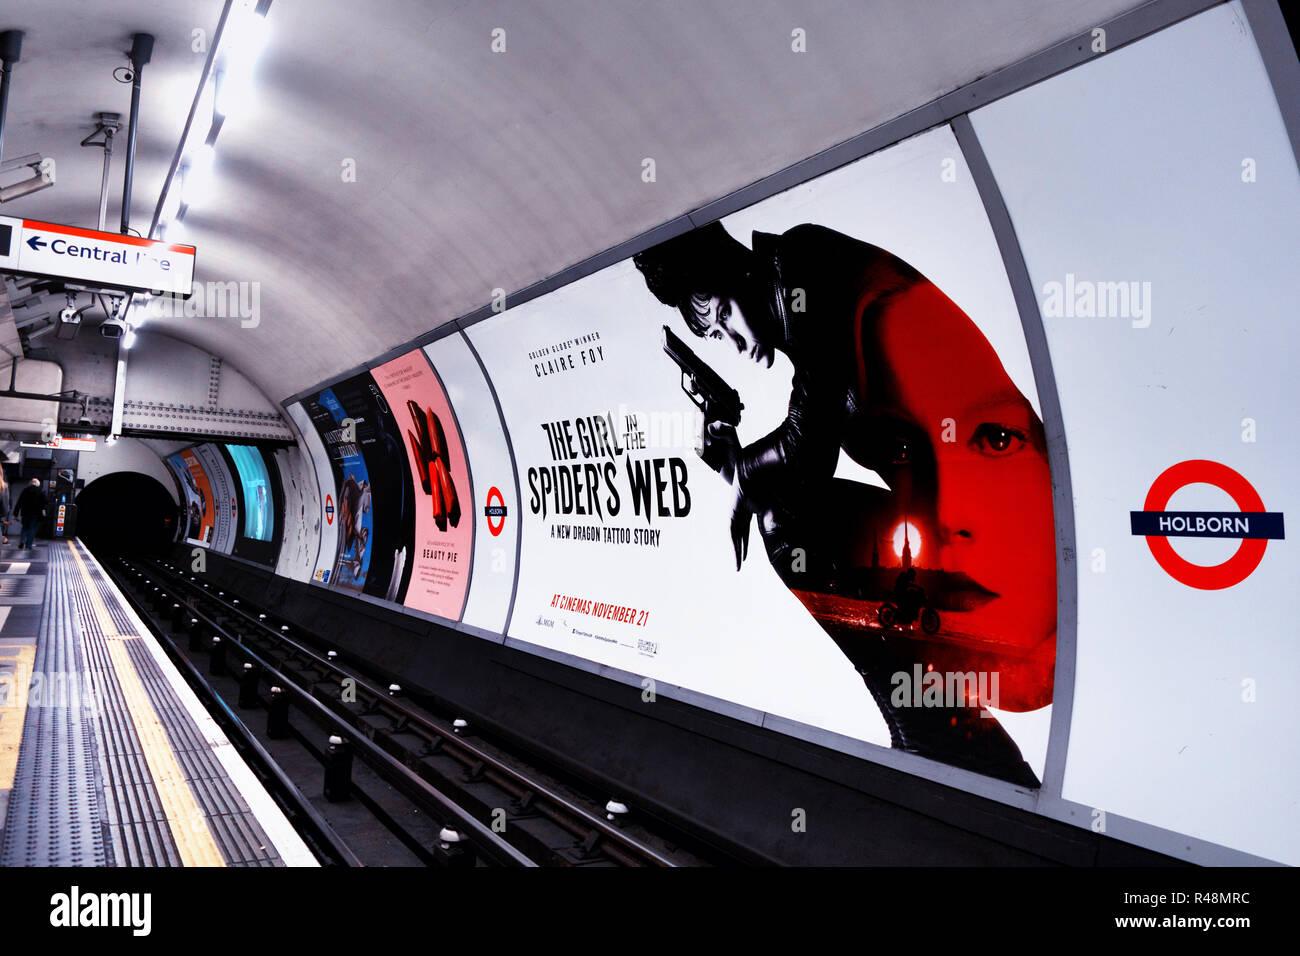 48 sheet billboard Advertising new film next to tracks on the London Underground underground track - Stock Image